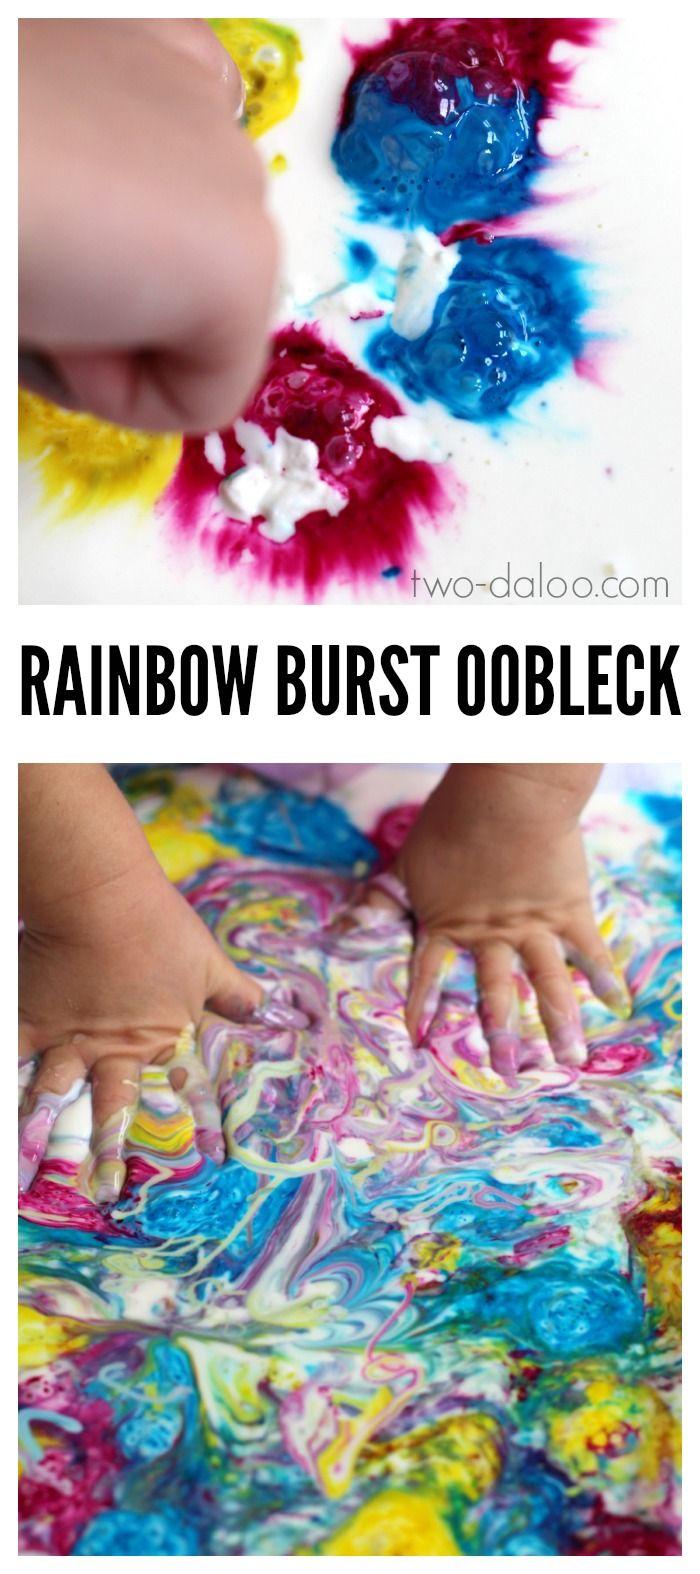 Rainbow Burst Oobleck at Twodaloo